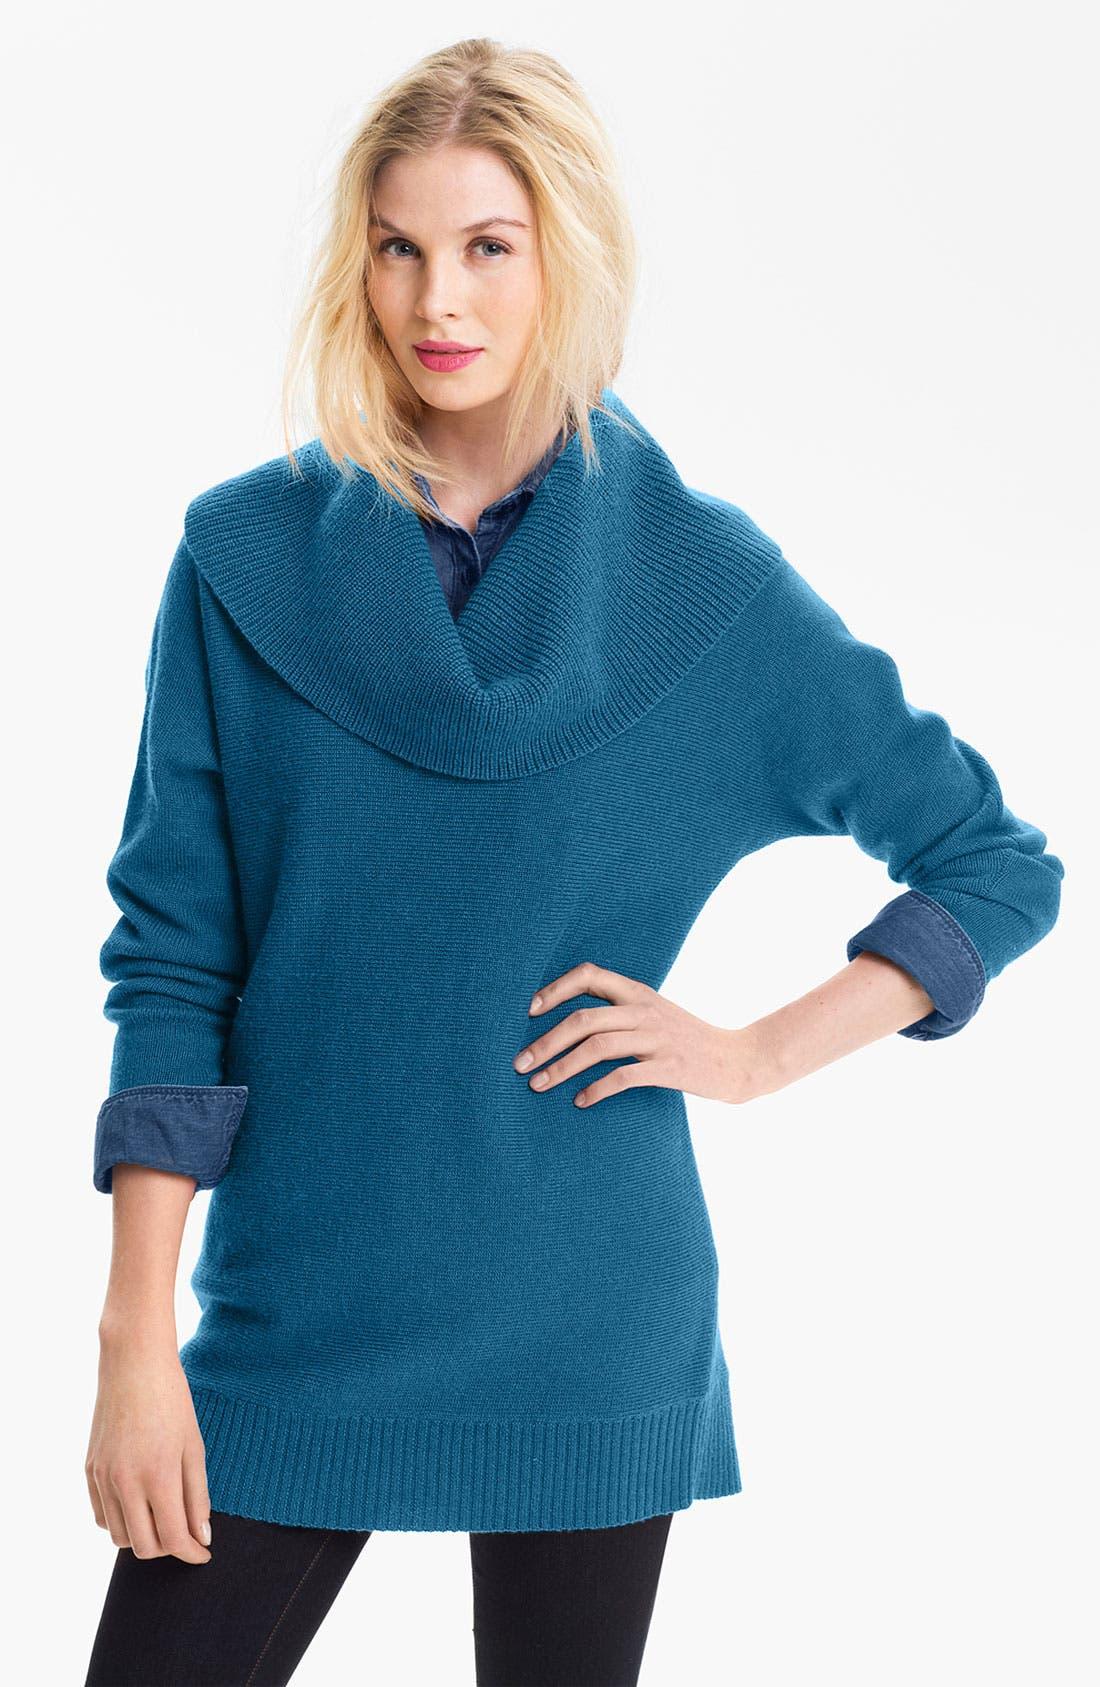 Alternate Image 1 Selected - Caslon® Cowl Neck Dolman Sweater (Petite)